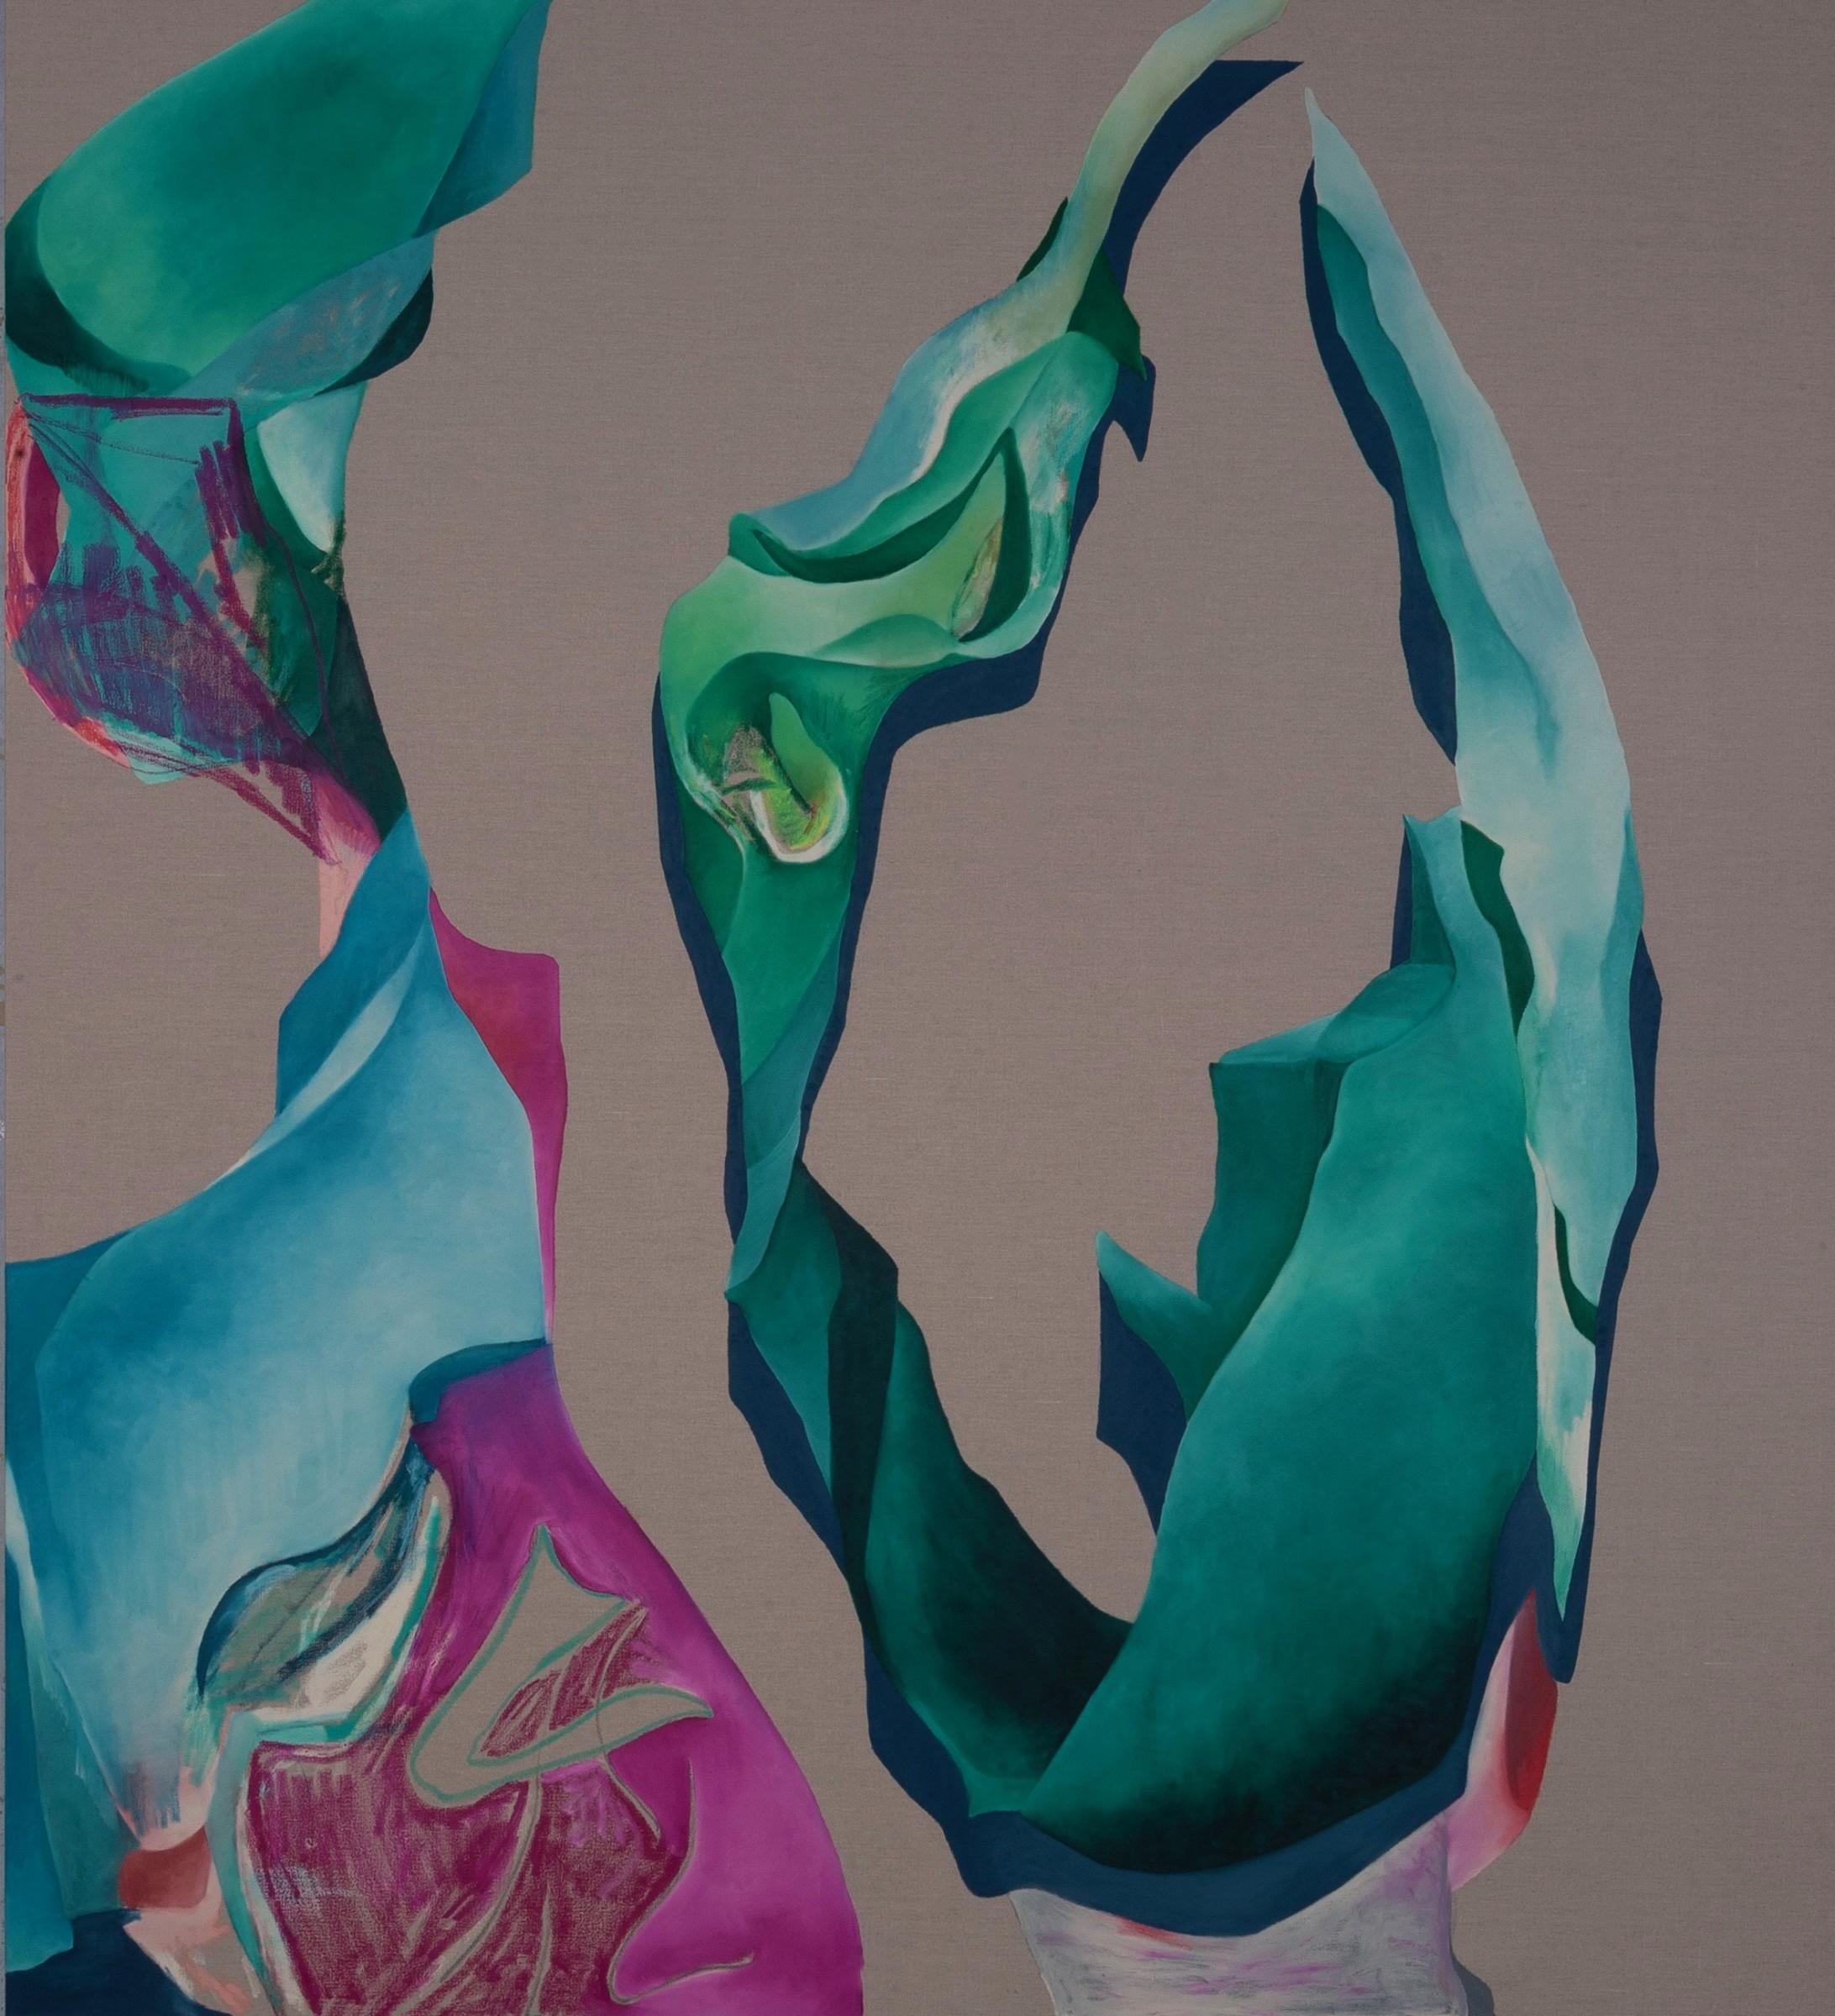 <span class=&#34;link fancybox-details-link&#34;><a href=&#34;/content/viewing-room/22/artworks5267/&#34;>View Detail Page</a></span><div class=&#34;artist&#34;><strong>Florentijn de Boer</strong></div><div class=&#34;title&#34;><em>Untitled IV</em>, 2019</div><div class=&#34;medium&#34;>Oilbar on canvas</div><div class=&#34;dimensions&#34;>200 x 180 cm</div>€ 4,800.00